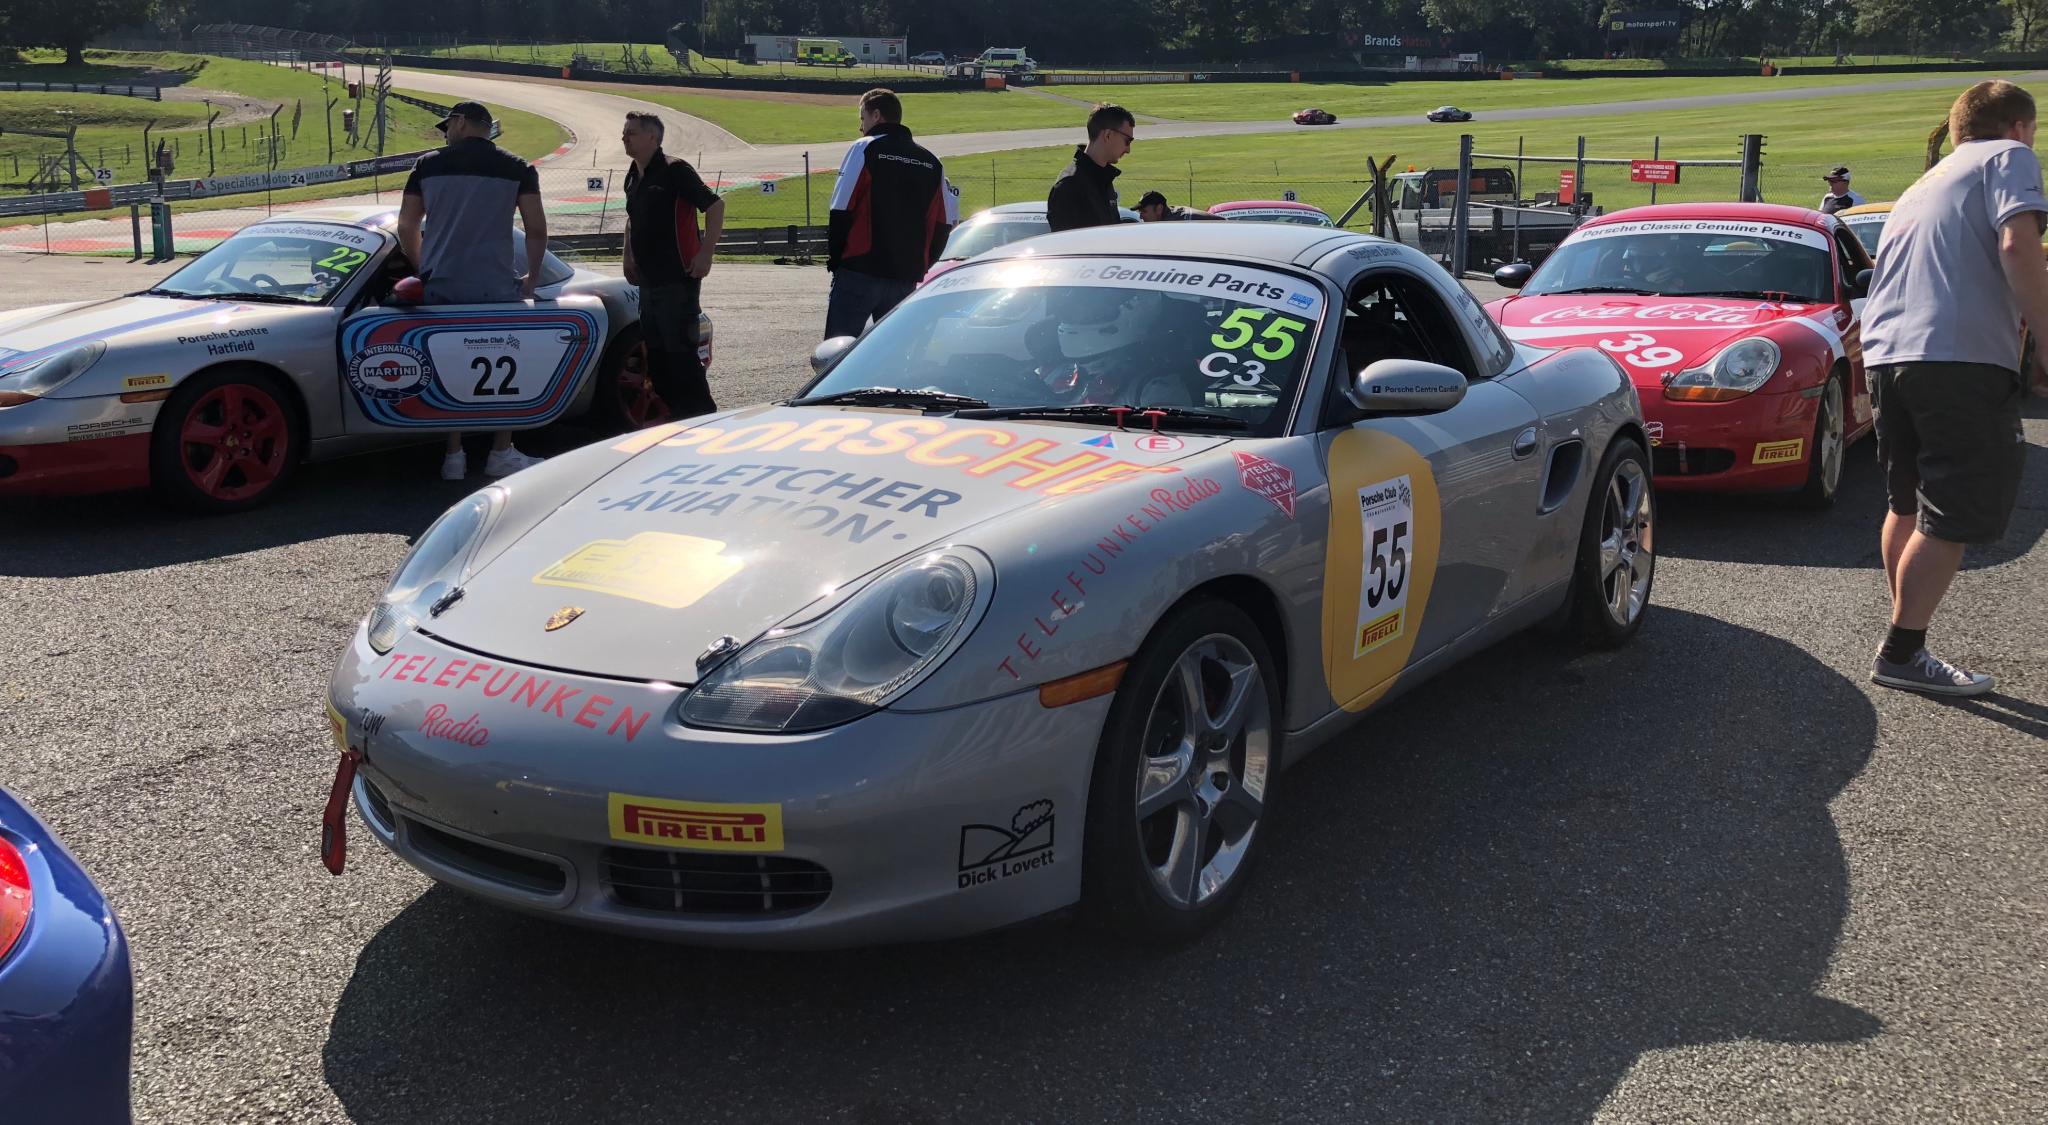 Dick Lovett Porsche's at Brands Hatch